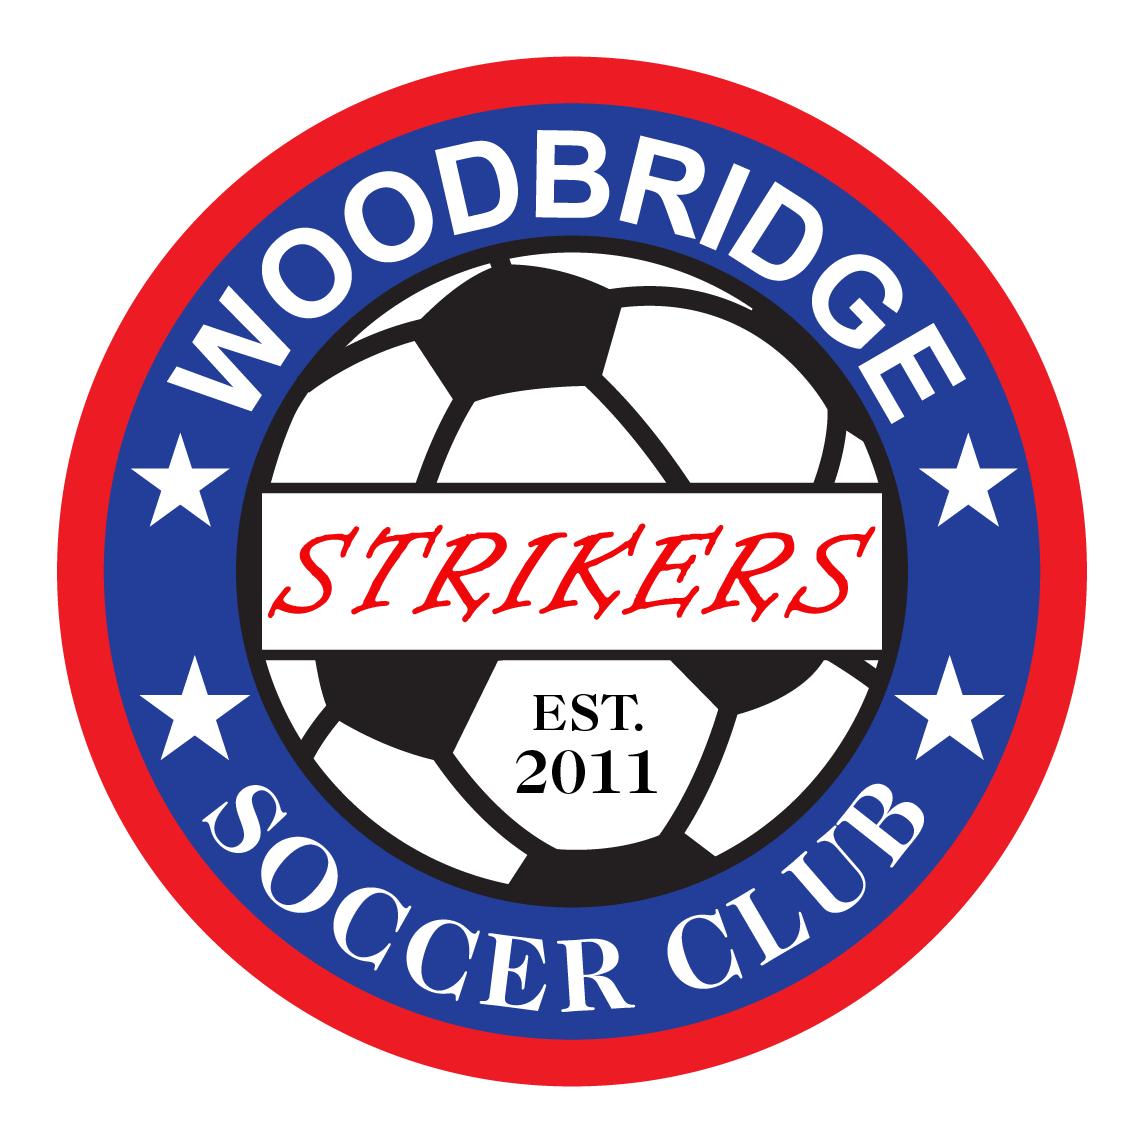 woodbridge-strikers